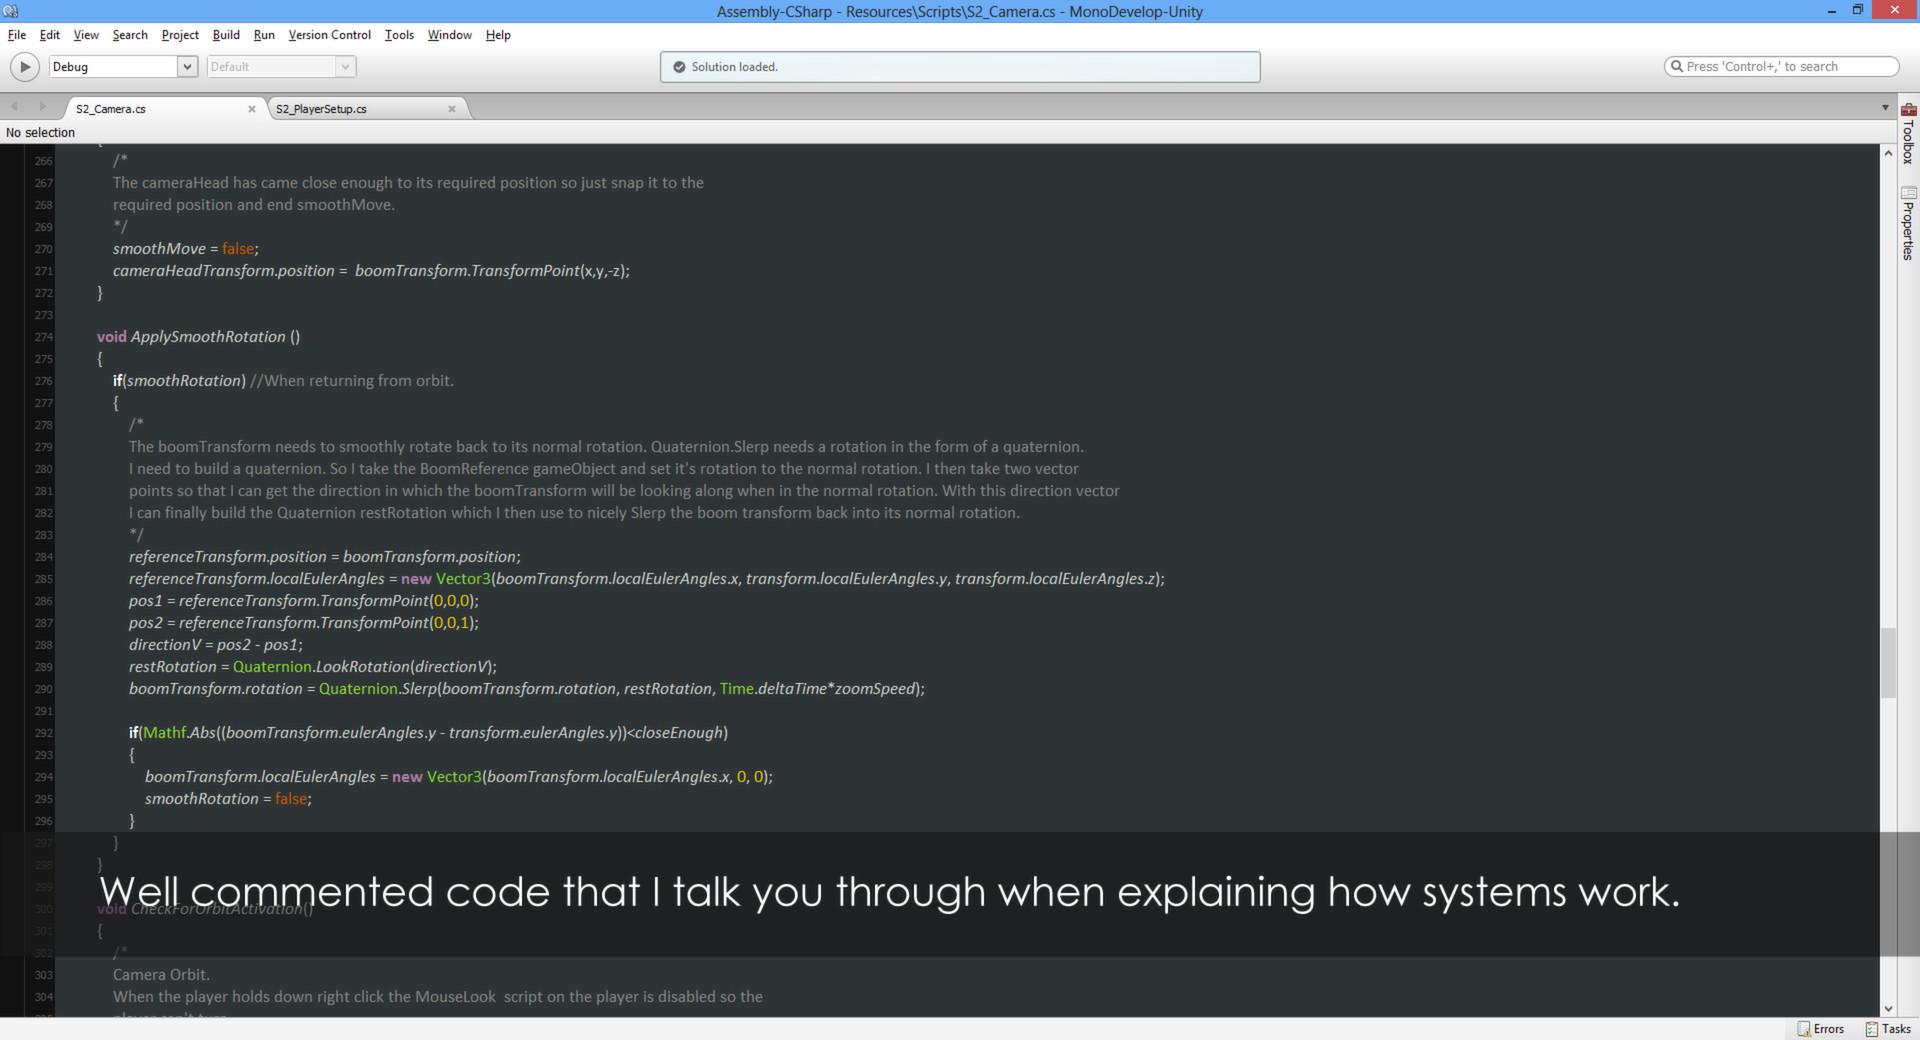 GTGD S2: Just One Dev screenshot